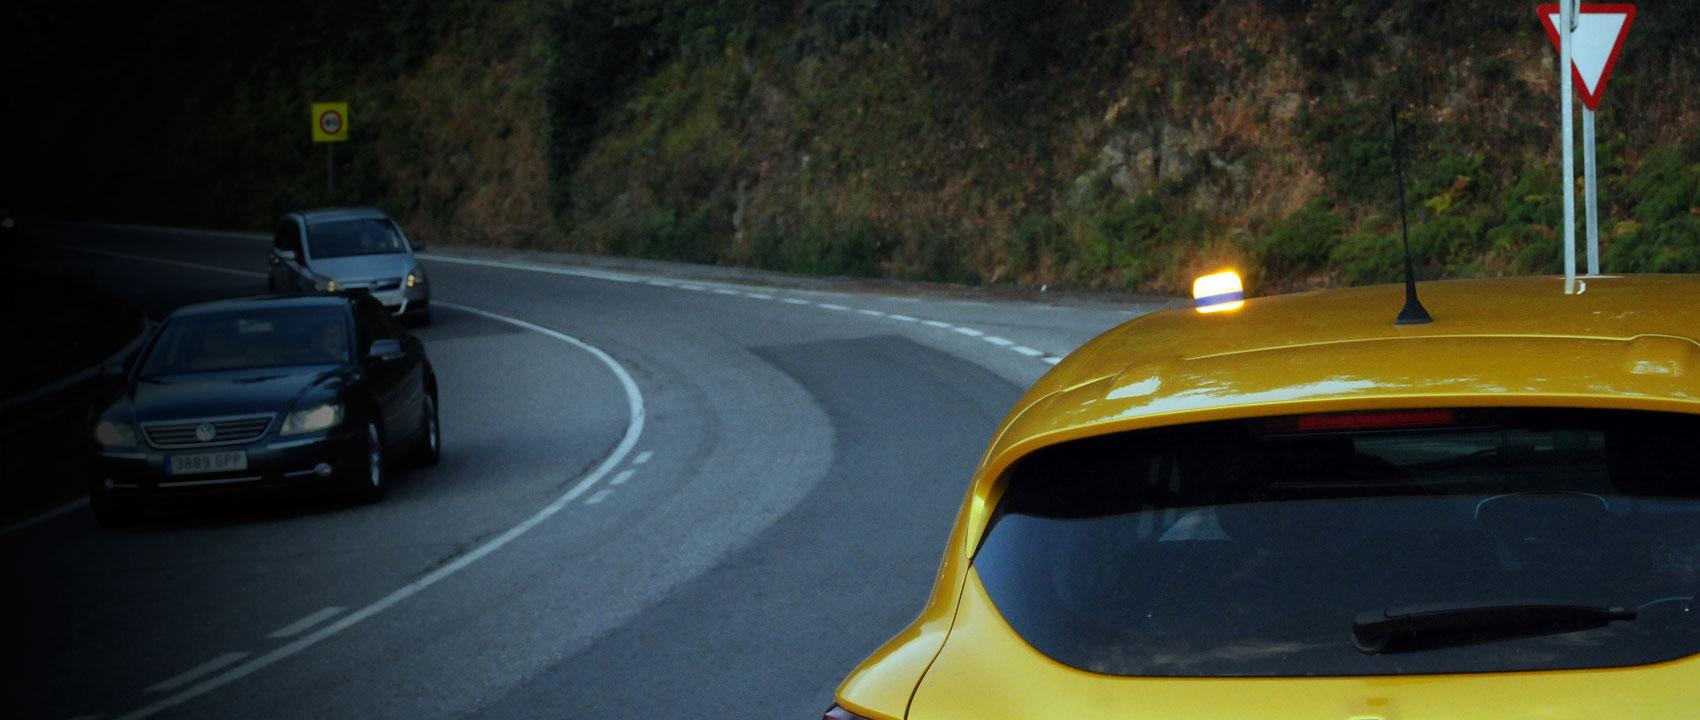 Rec Flash luz de emergencia destellos amarillo auto